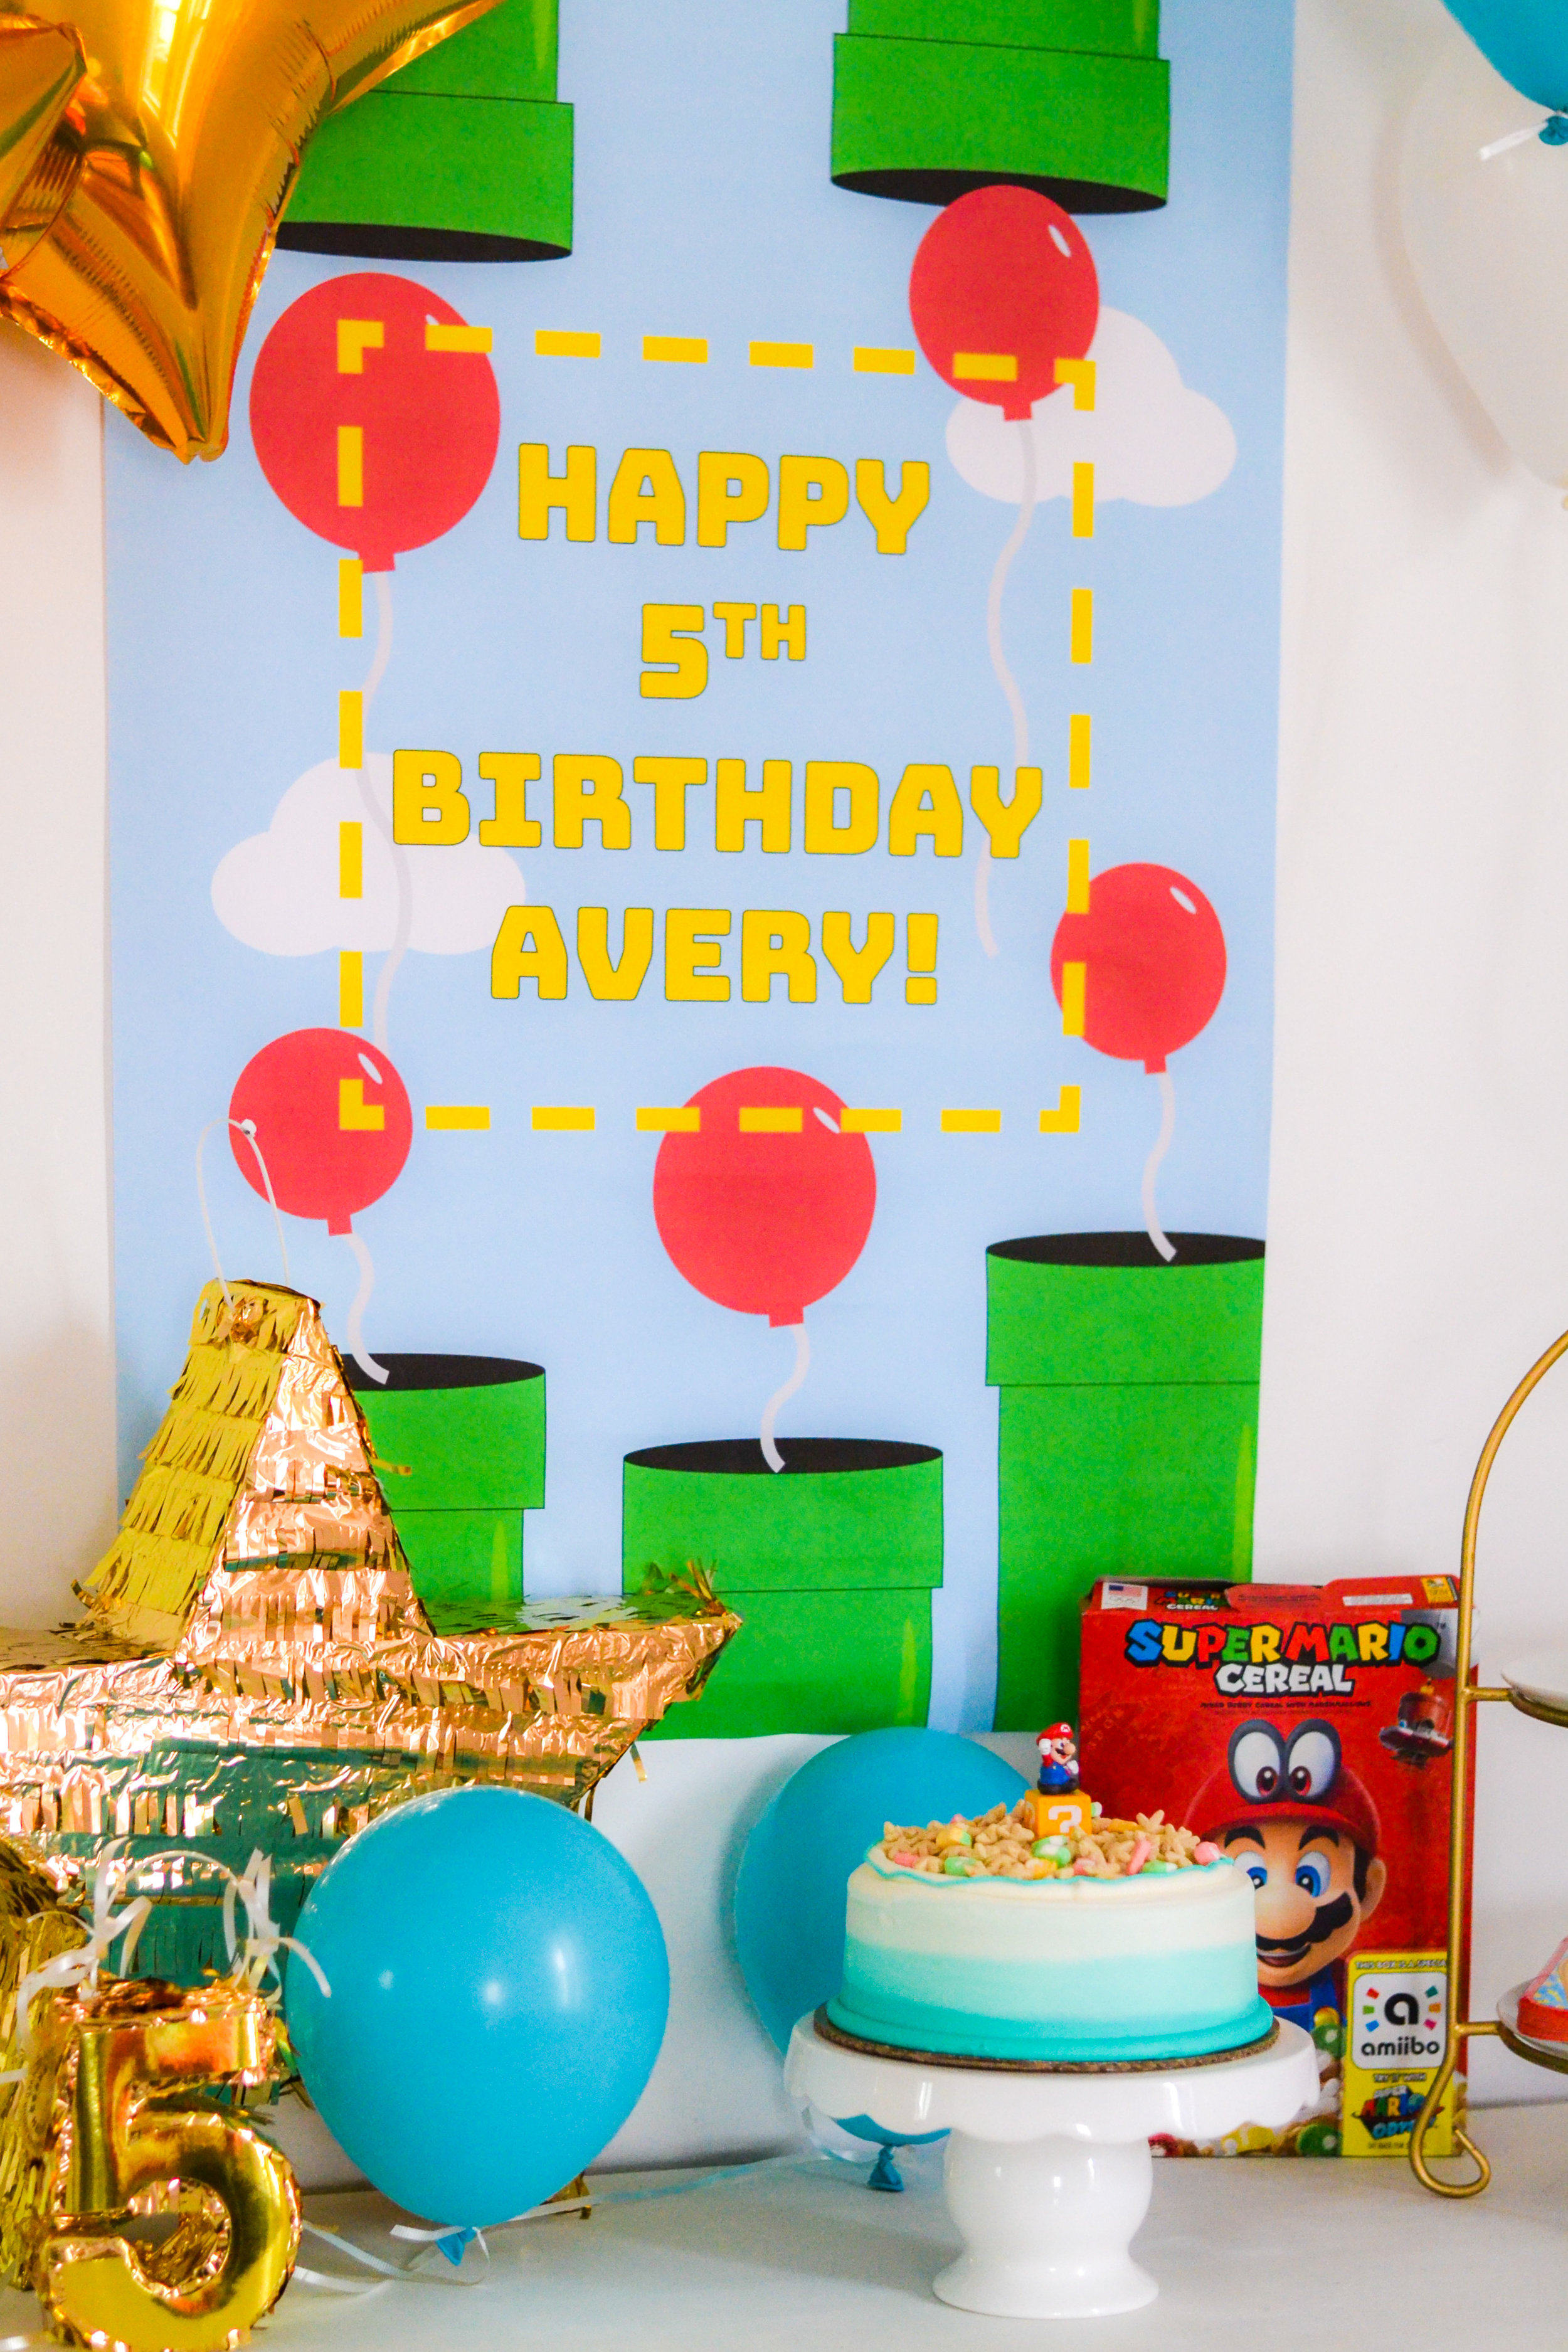 Averys5thbirthday.jpg